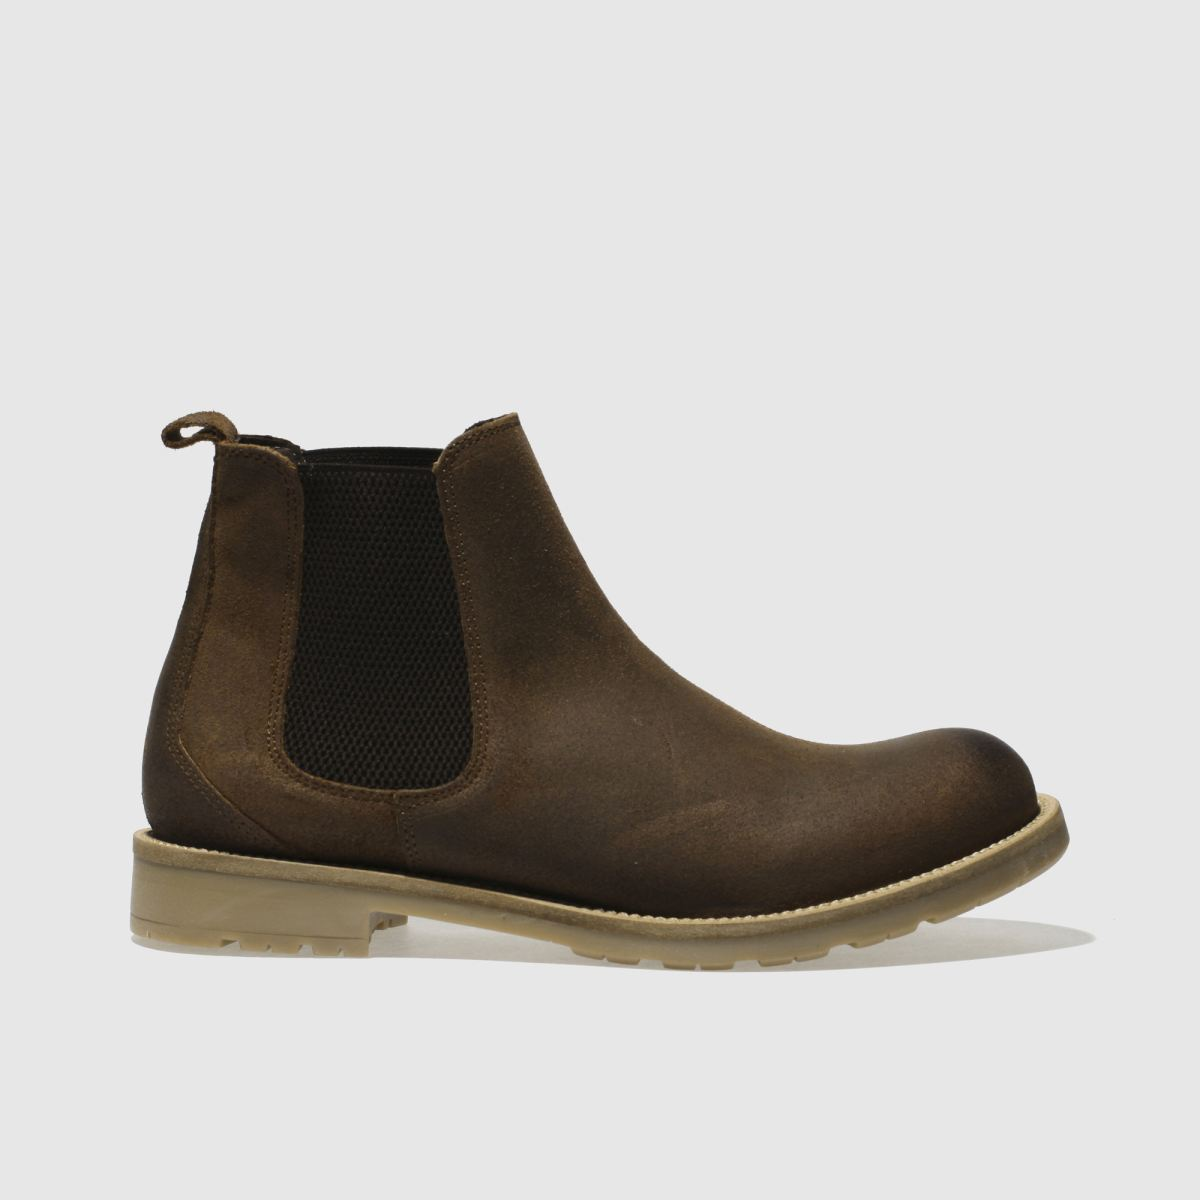 Schuh Brown Fletcher Chelsea Boots